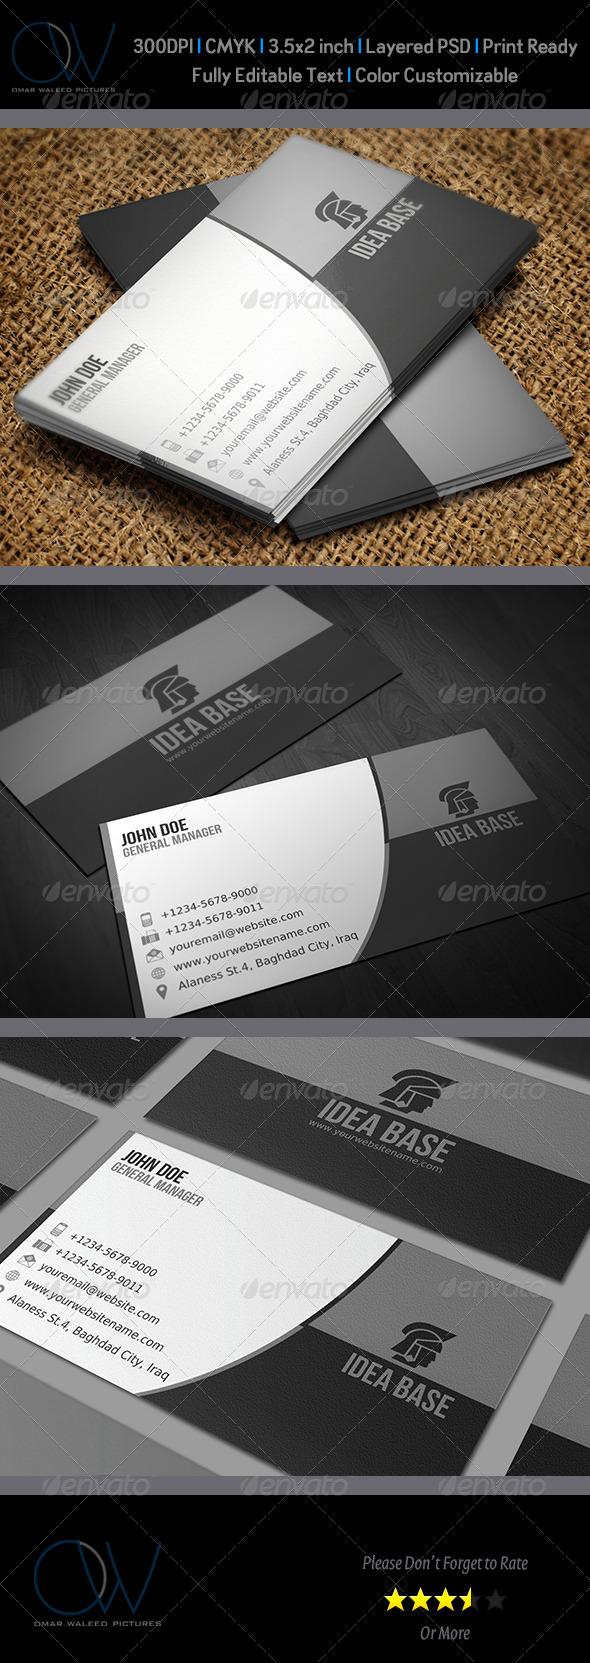 Corporate Business Card Vol.4 - Corporate Business Cards